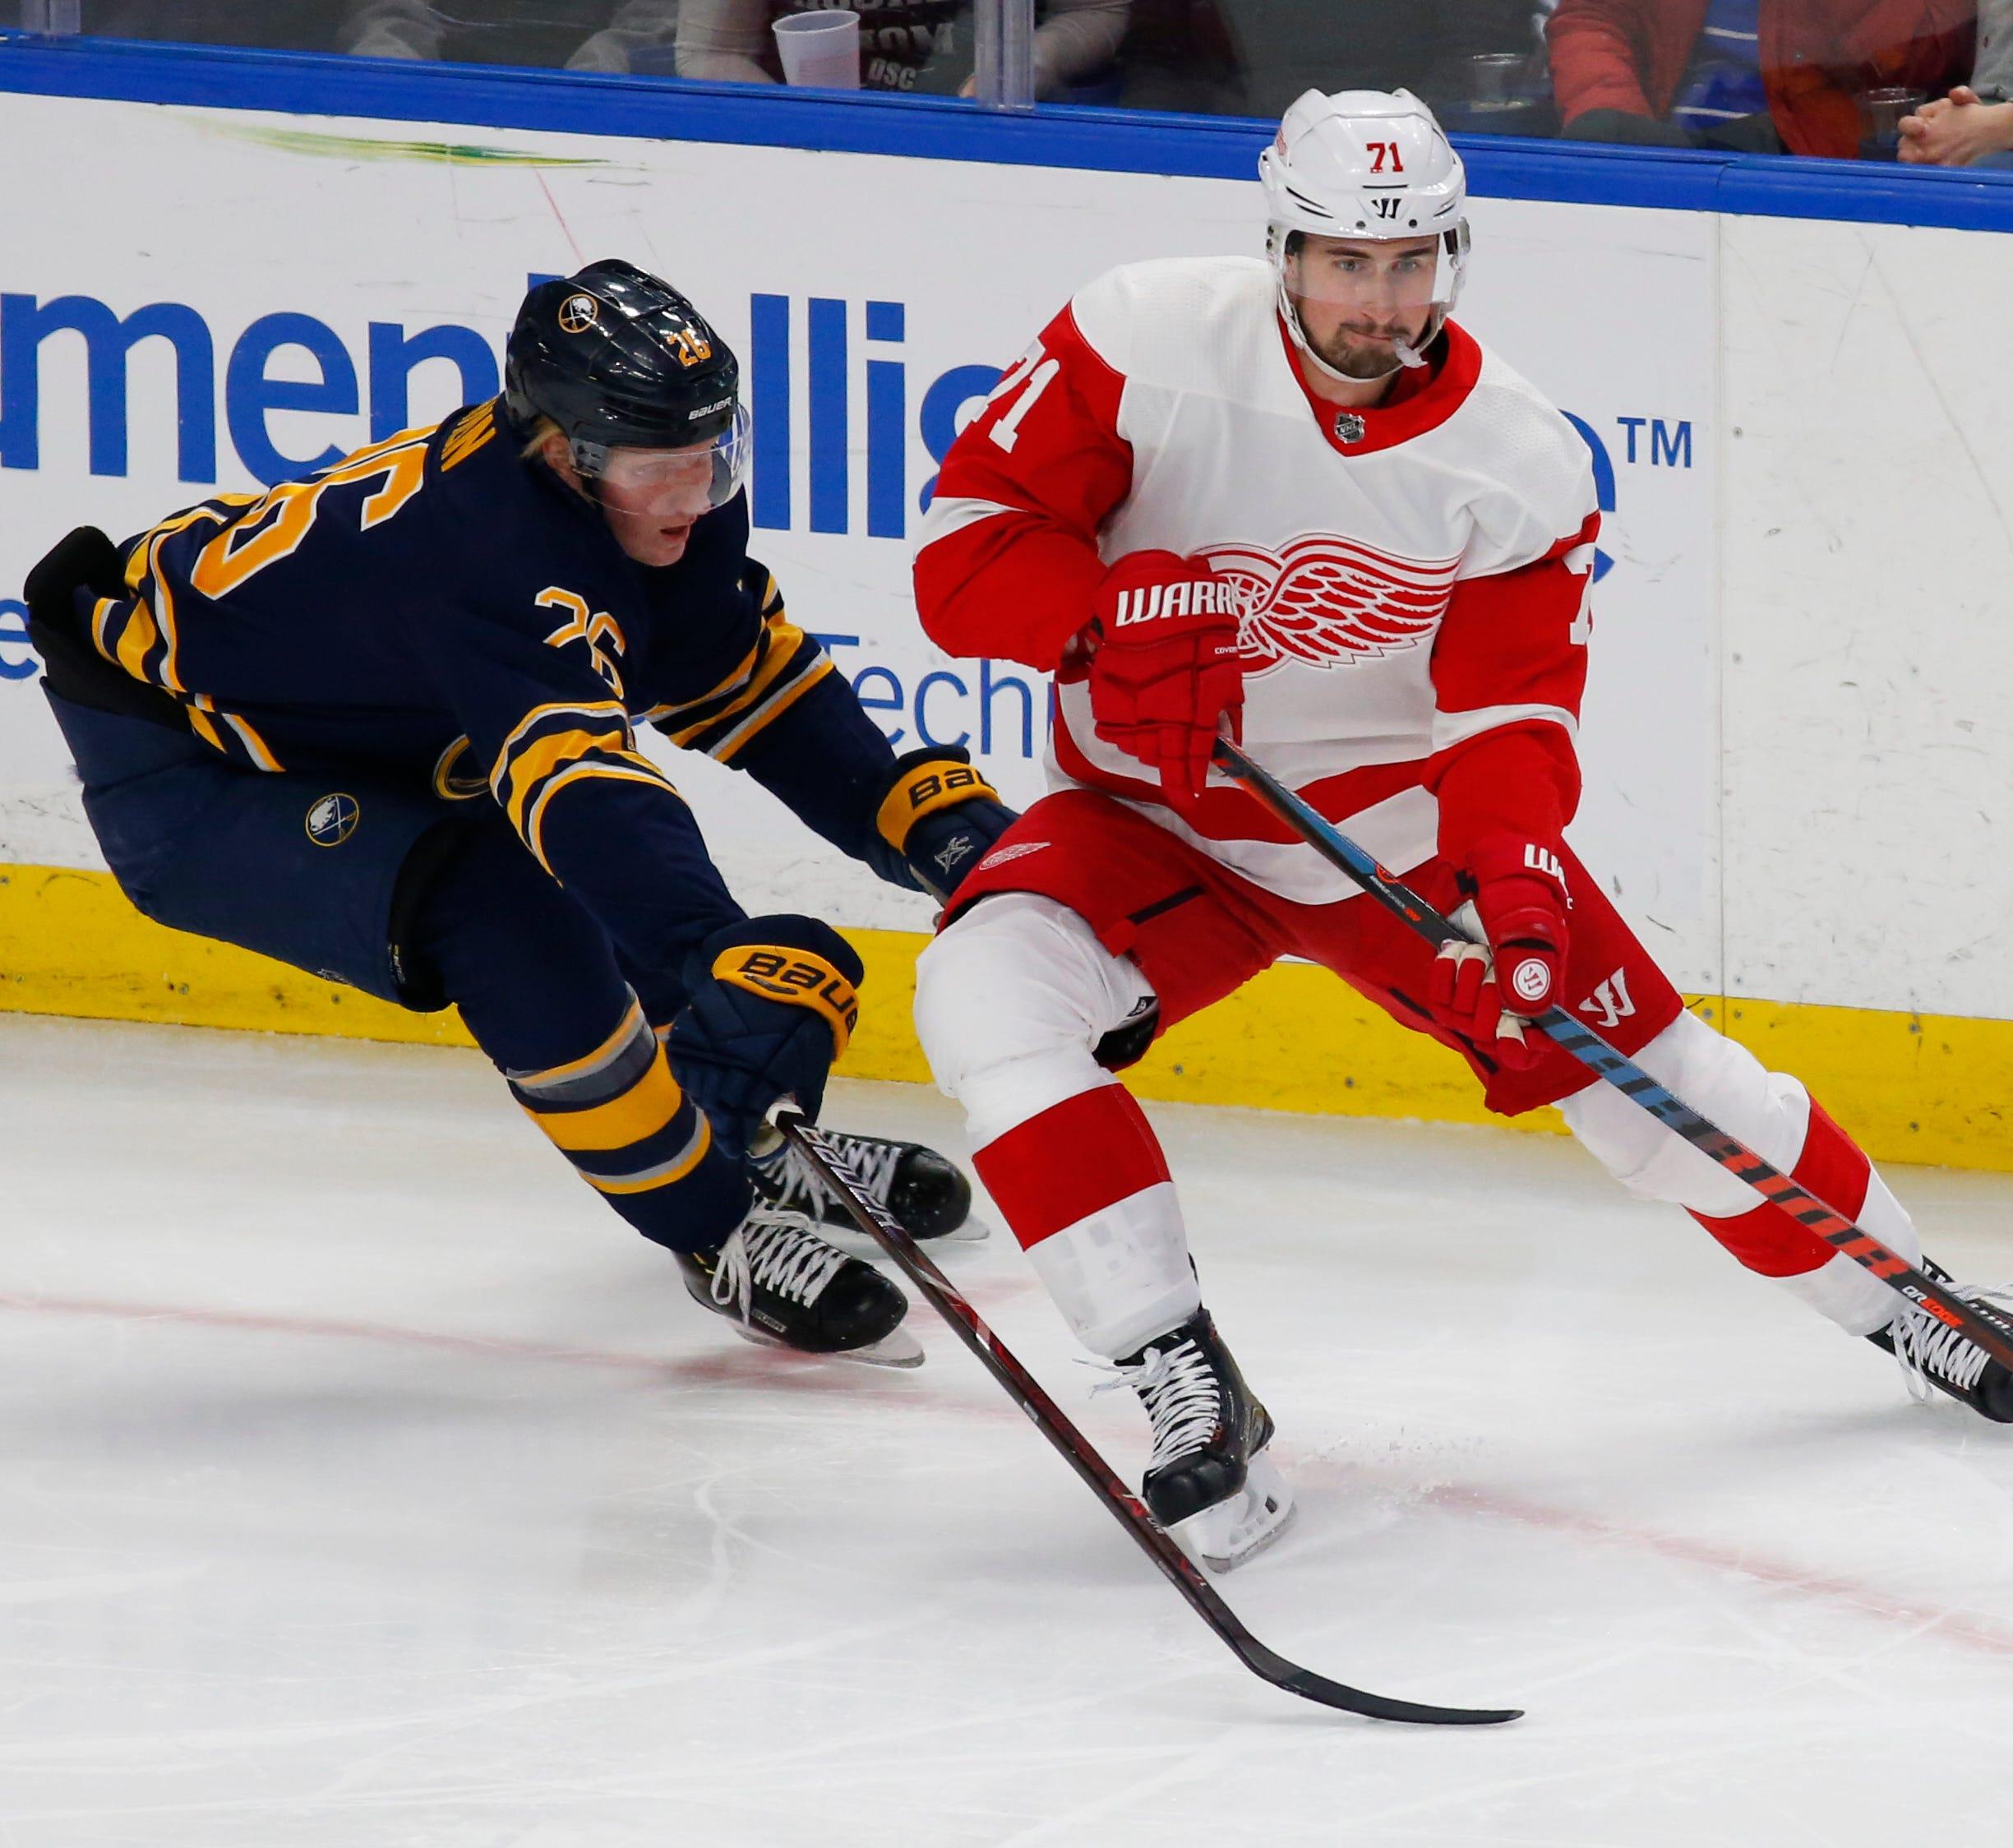 Sabres defenseman Rasmus Dahlin defends Red Wings forward Dylan Larkin during the first period on Saturday, Feb. 9, 2019, in Buffalo N.Y.